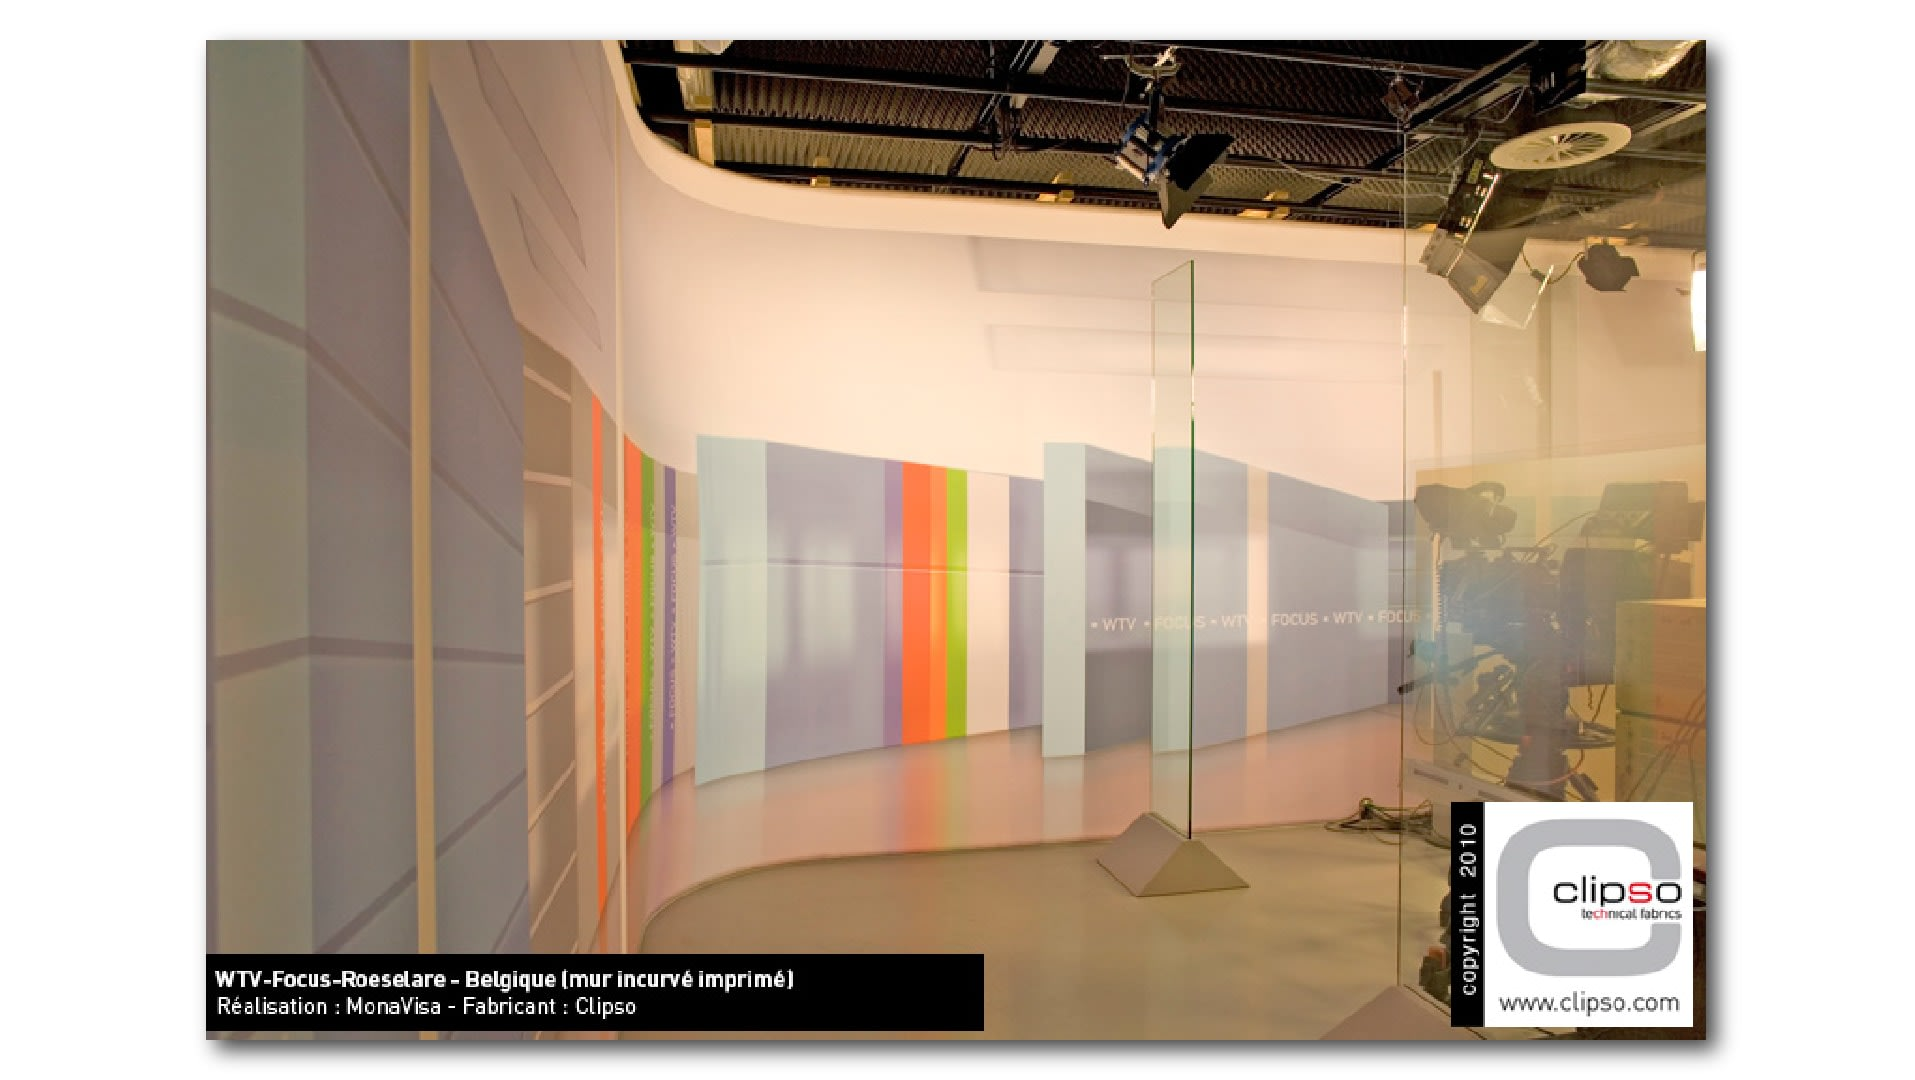 Wandgestaltung-im-Fernsehstudio-mit-flächig-bedruckter-Wandbespannung-01_aj6kci